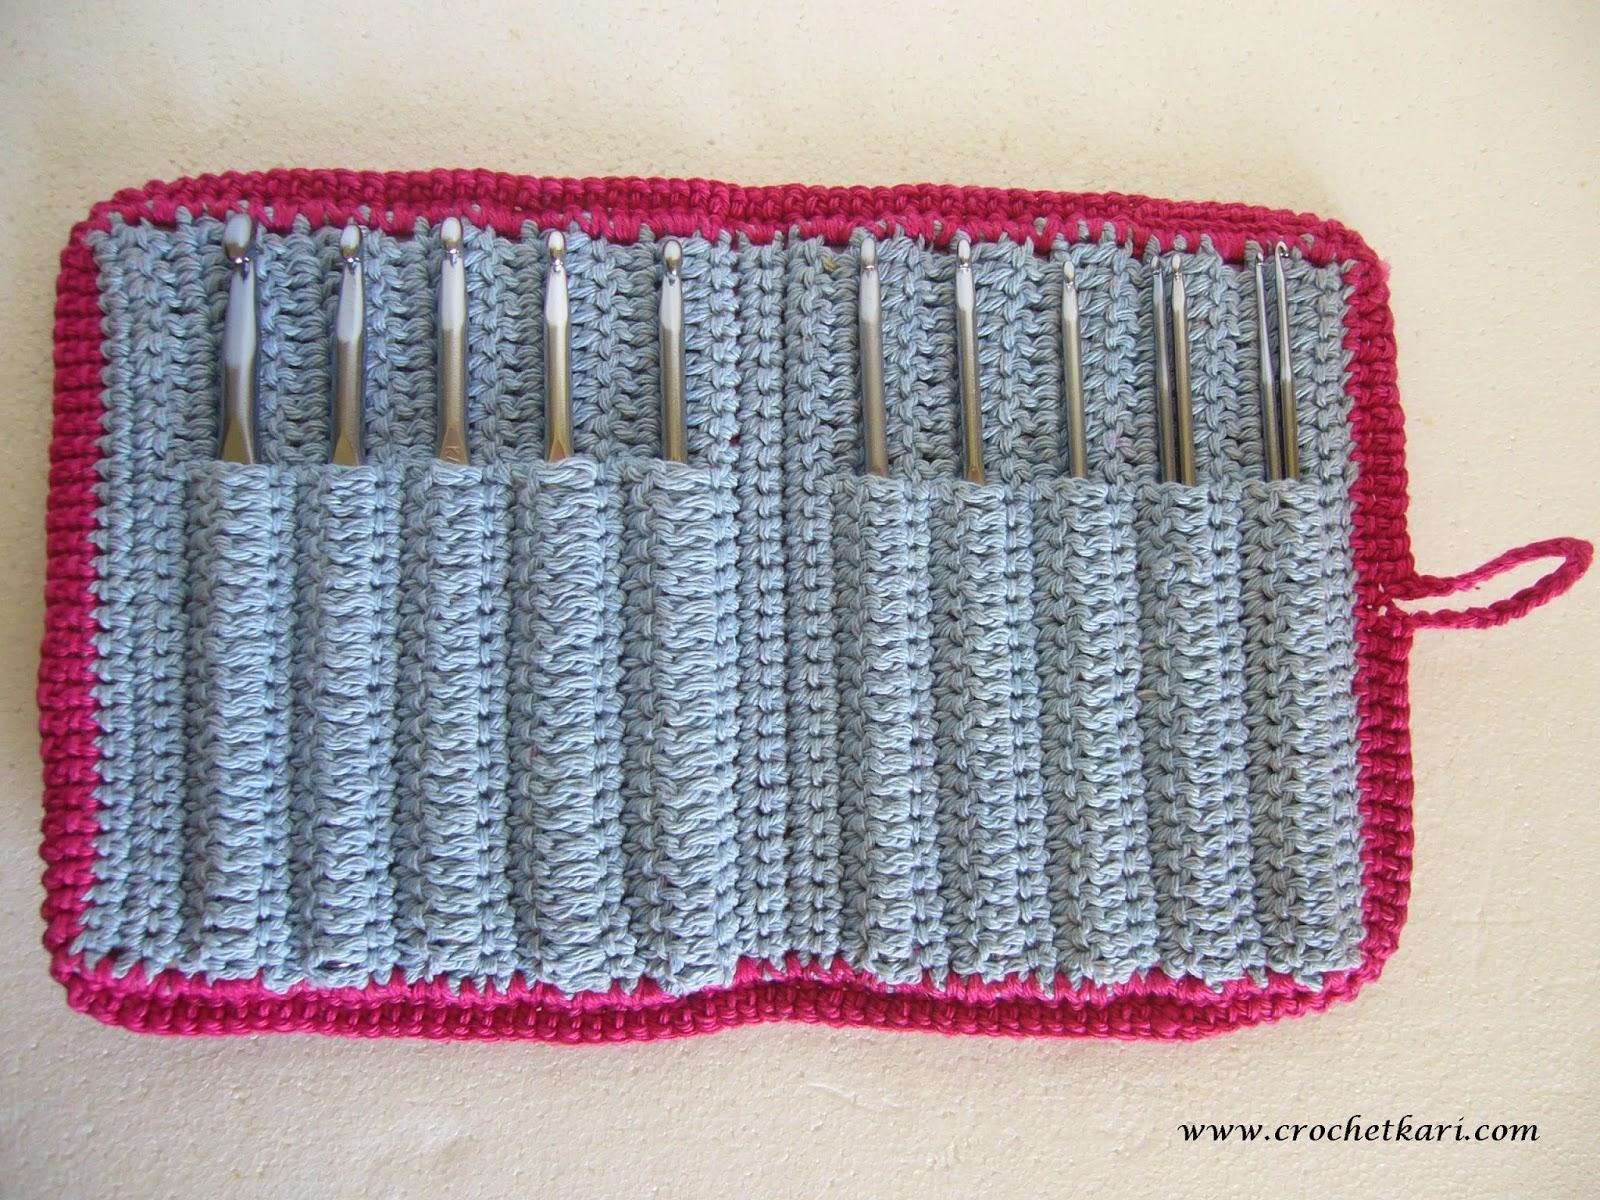 Crochetkari: Free Pattern Links